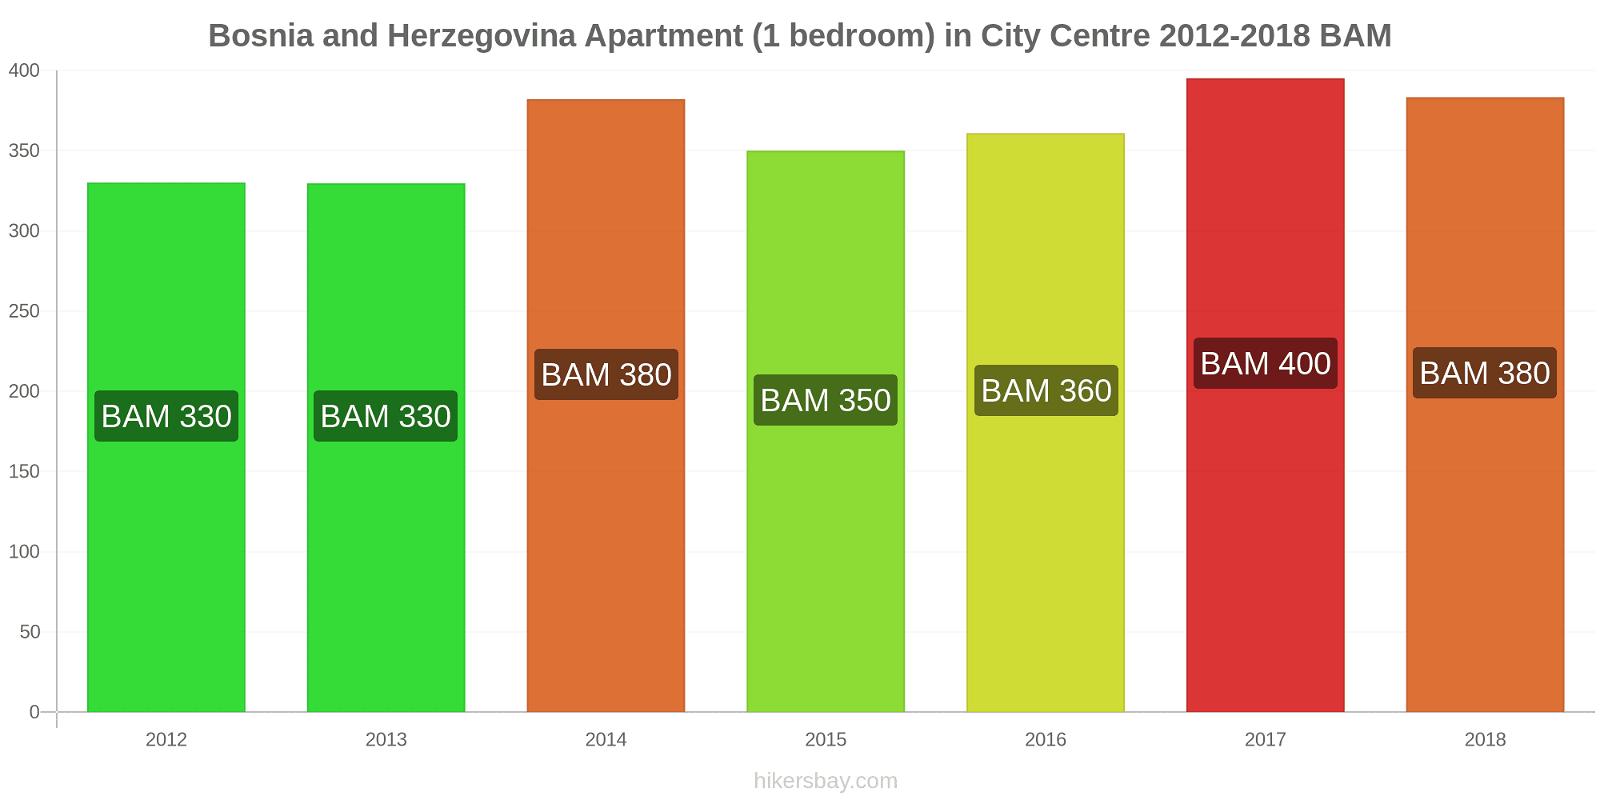 Bosnia and Herzegovina price changes Apartment (1 bedroom) in City Centre hikersbay.com